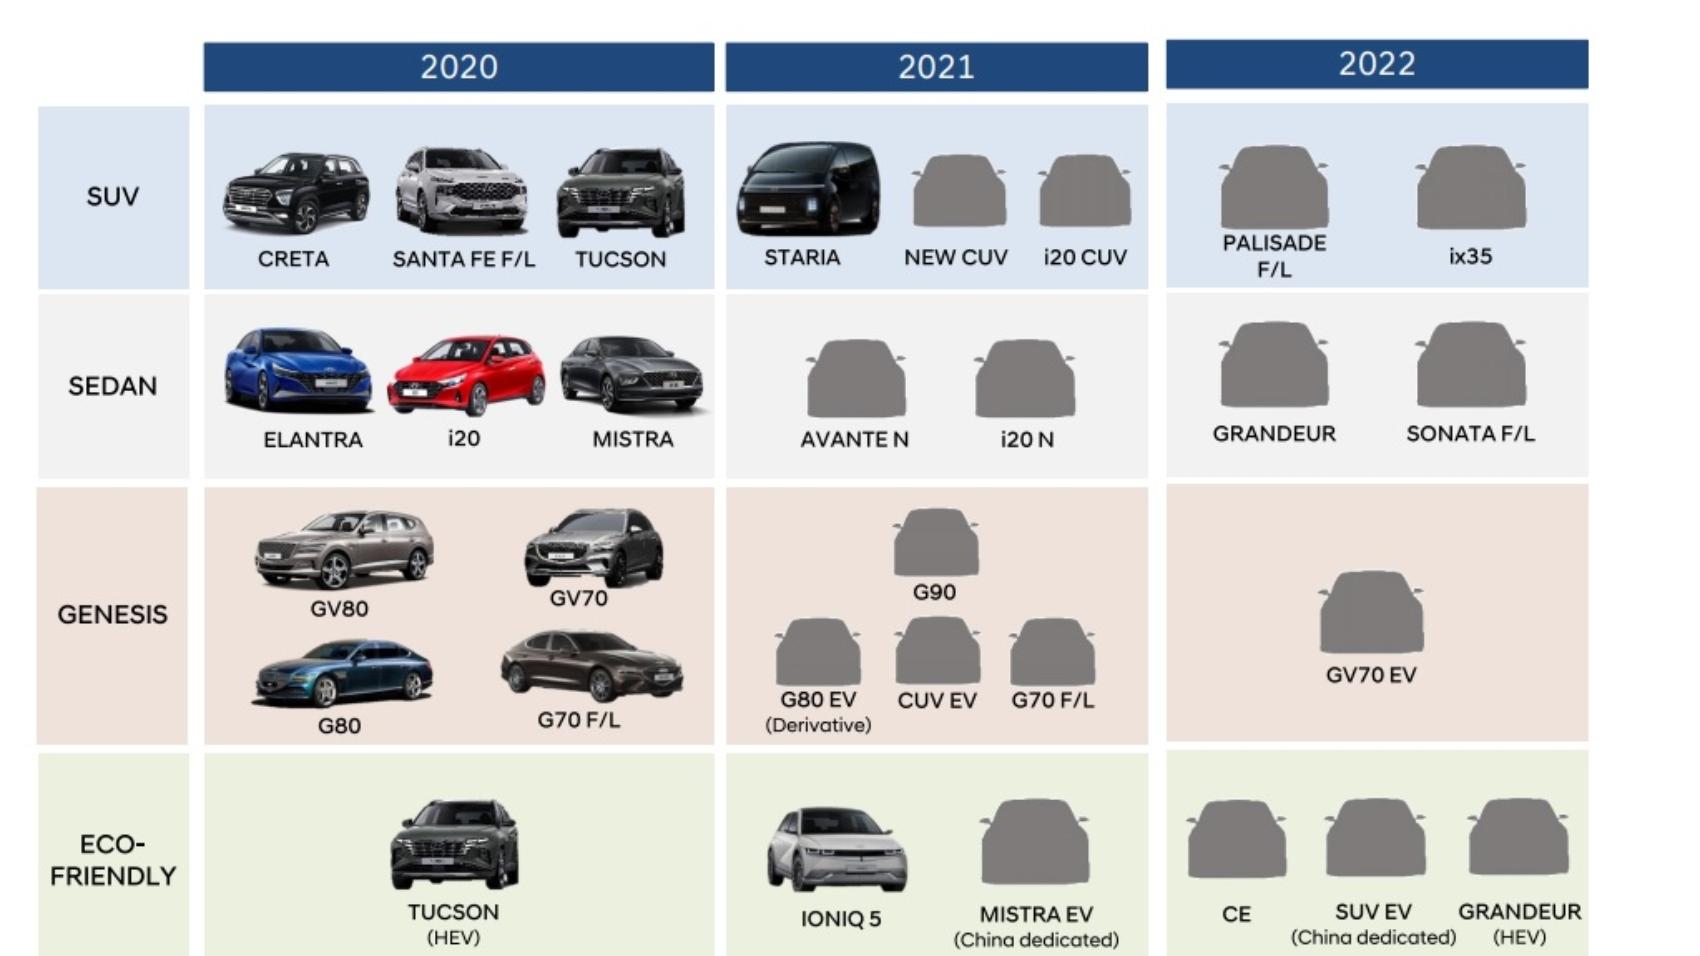 Genesis product roadmap